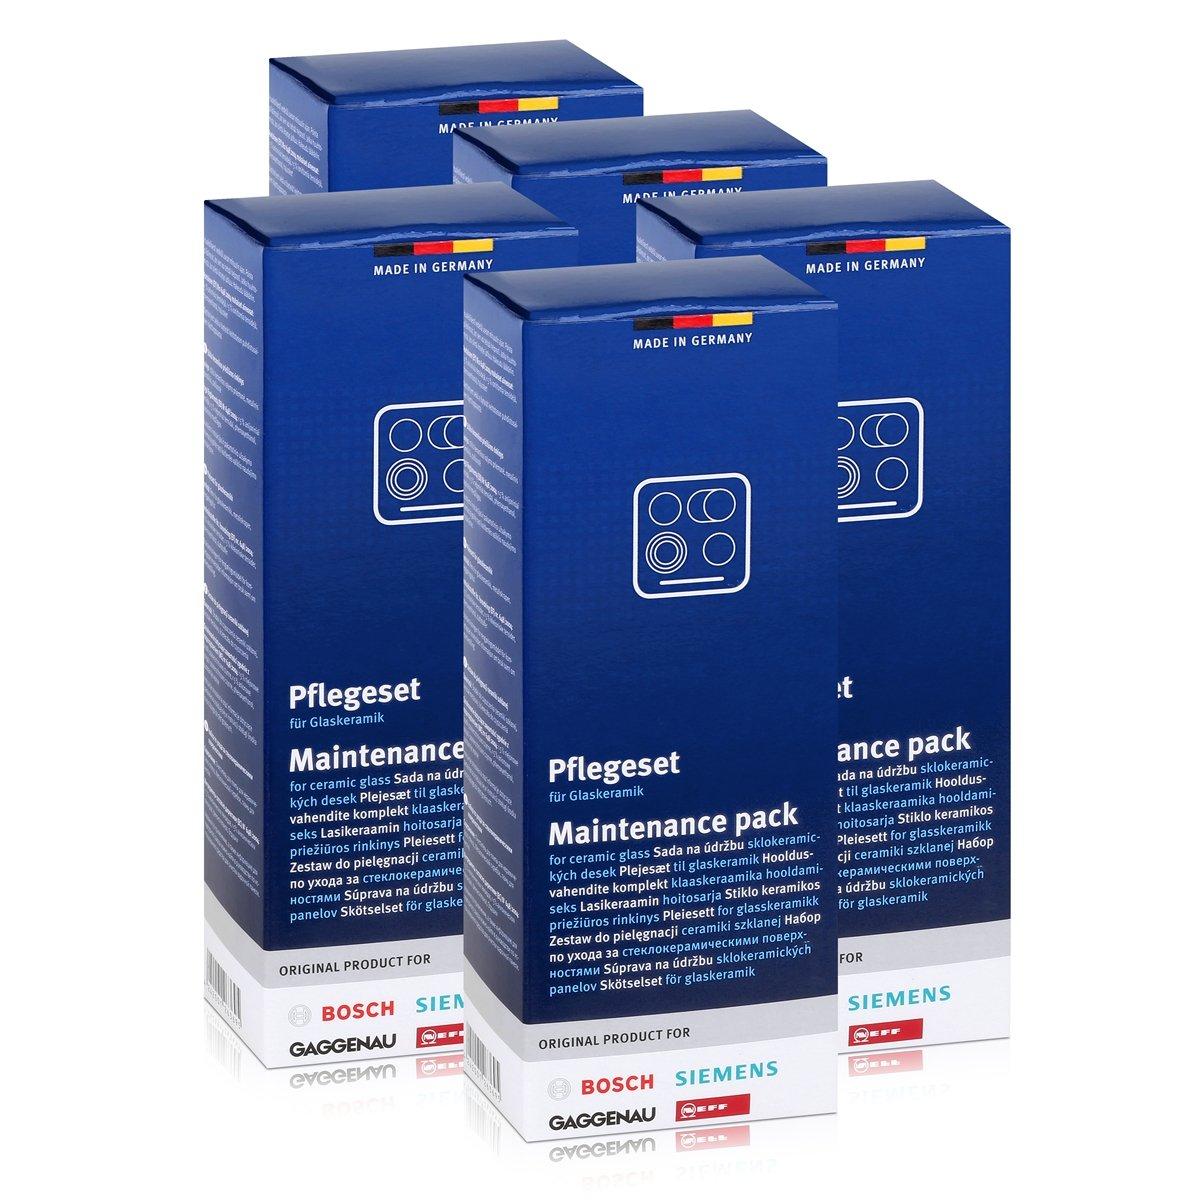 5x Kit de mantenimiento Bosch / Siemens para placas de ...